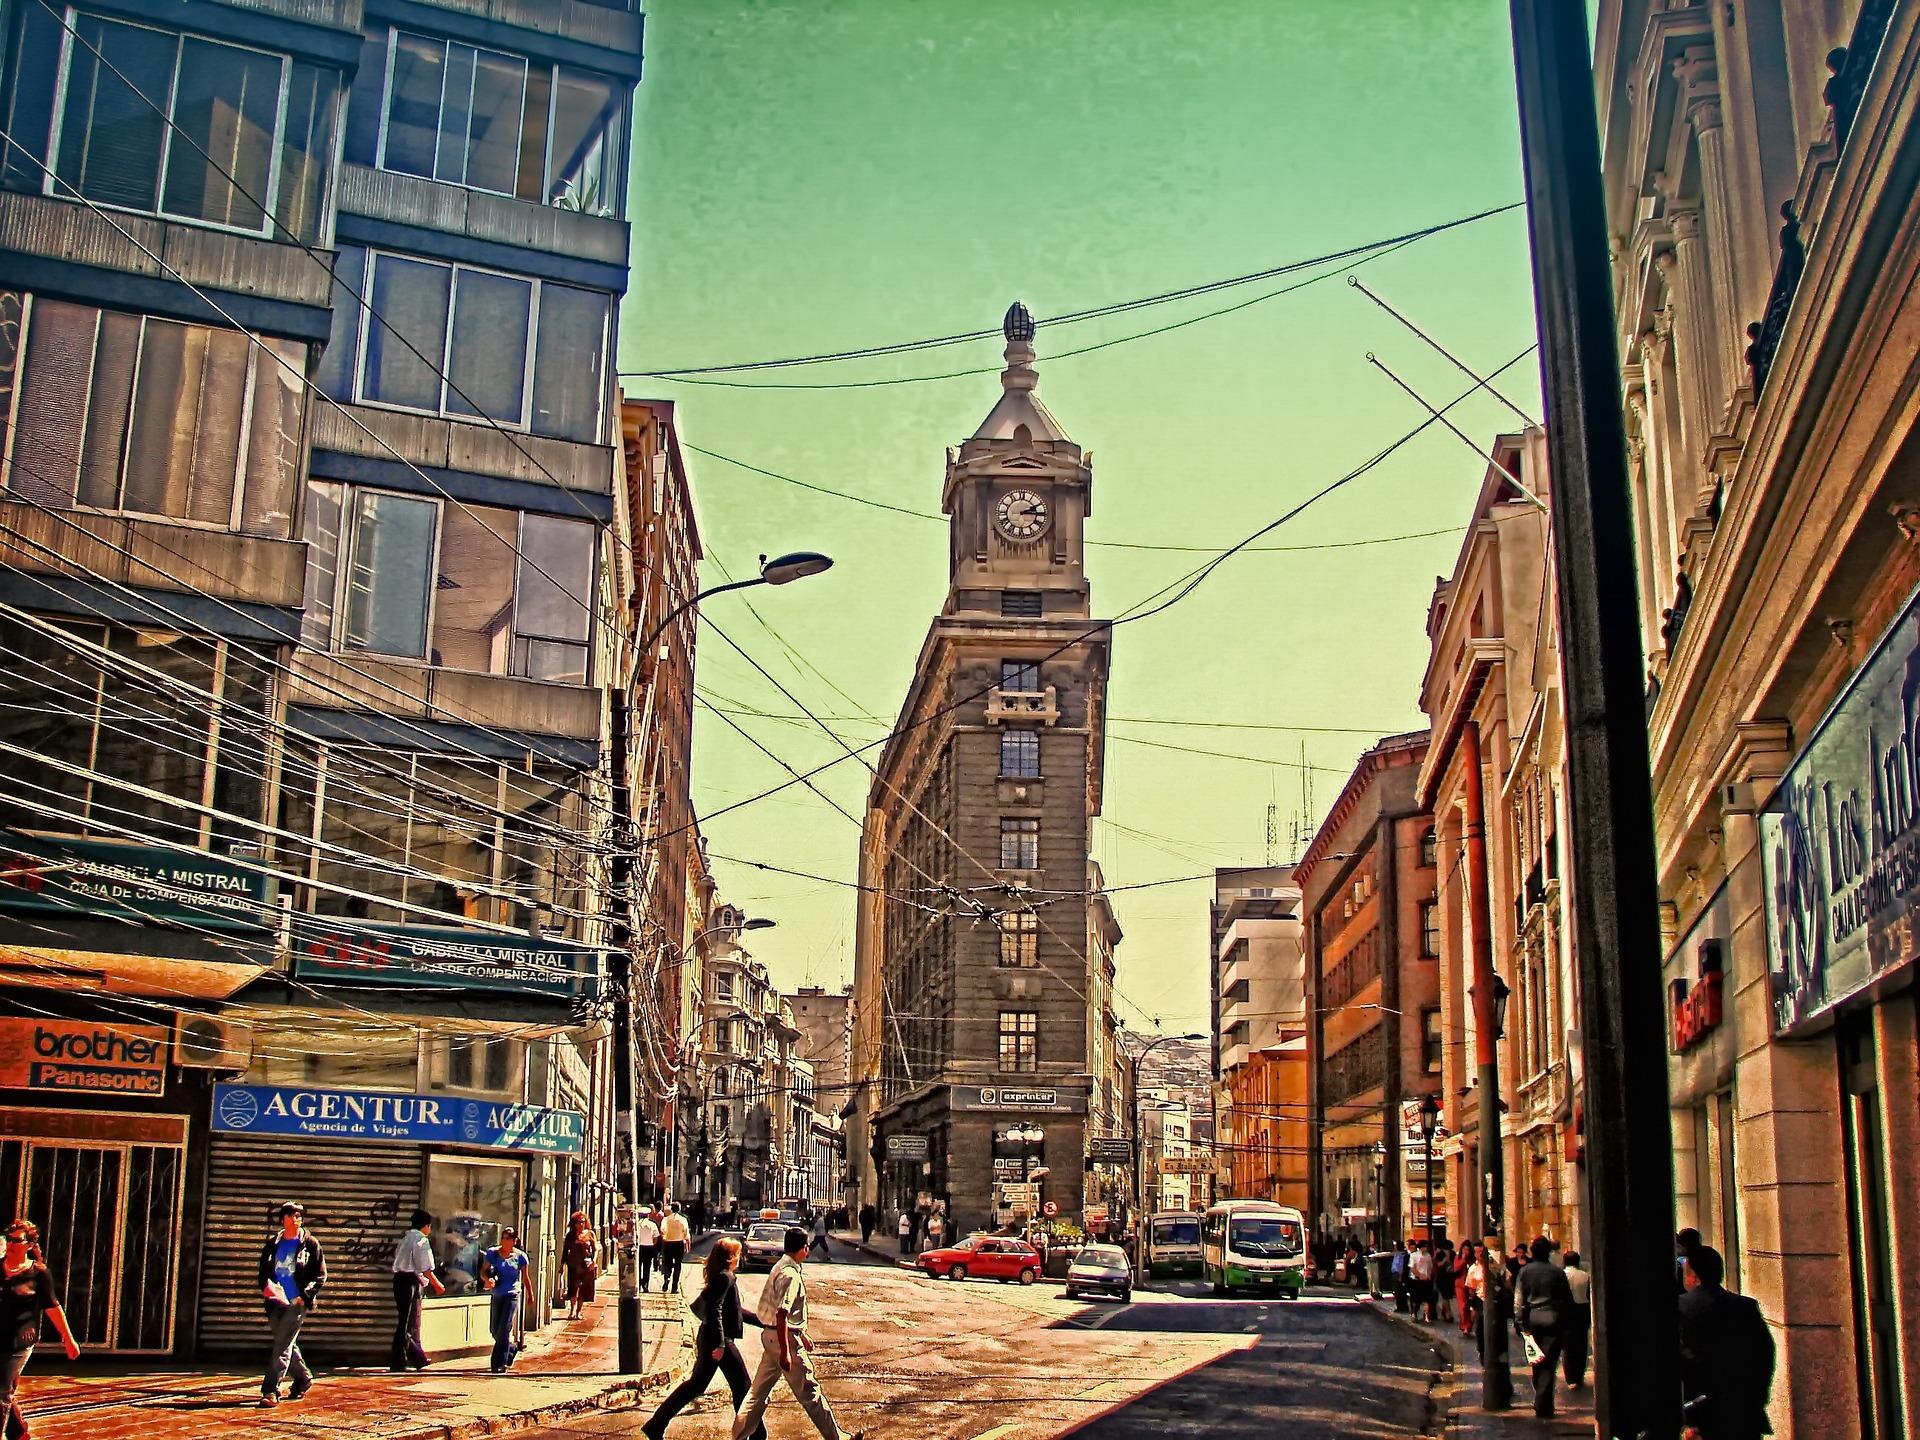 Discover Valparaiso | Turri Clock, Valparaiso, Chile